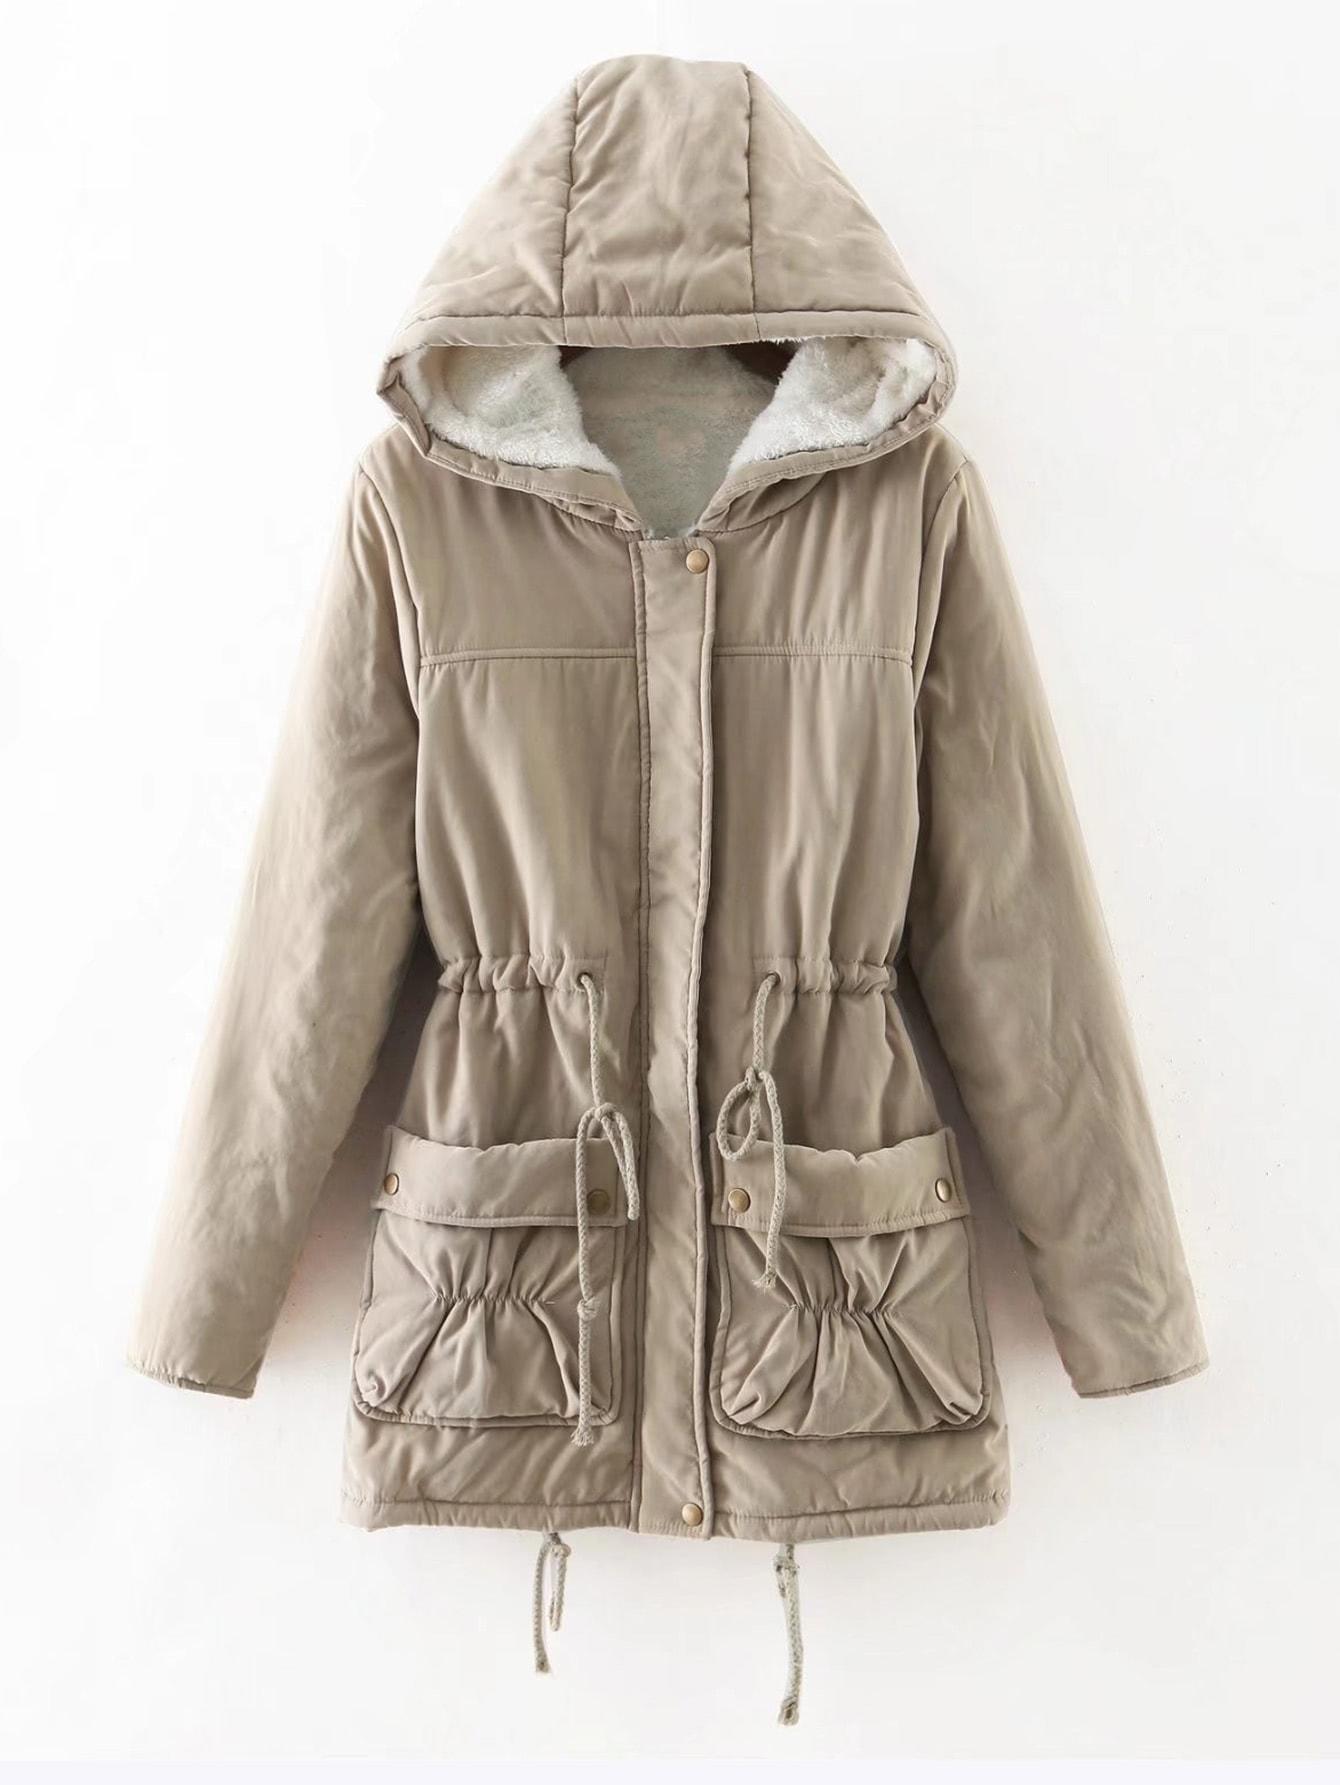 Faux Fur Lined Utility Parka Coat -SheIn(Sheinside)